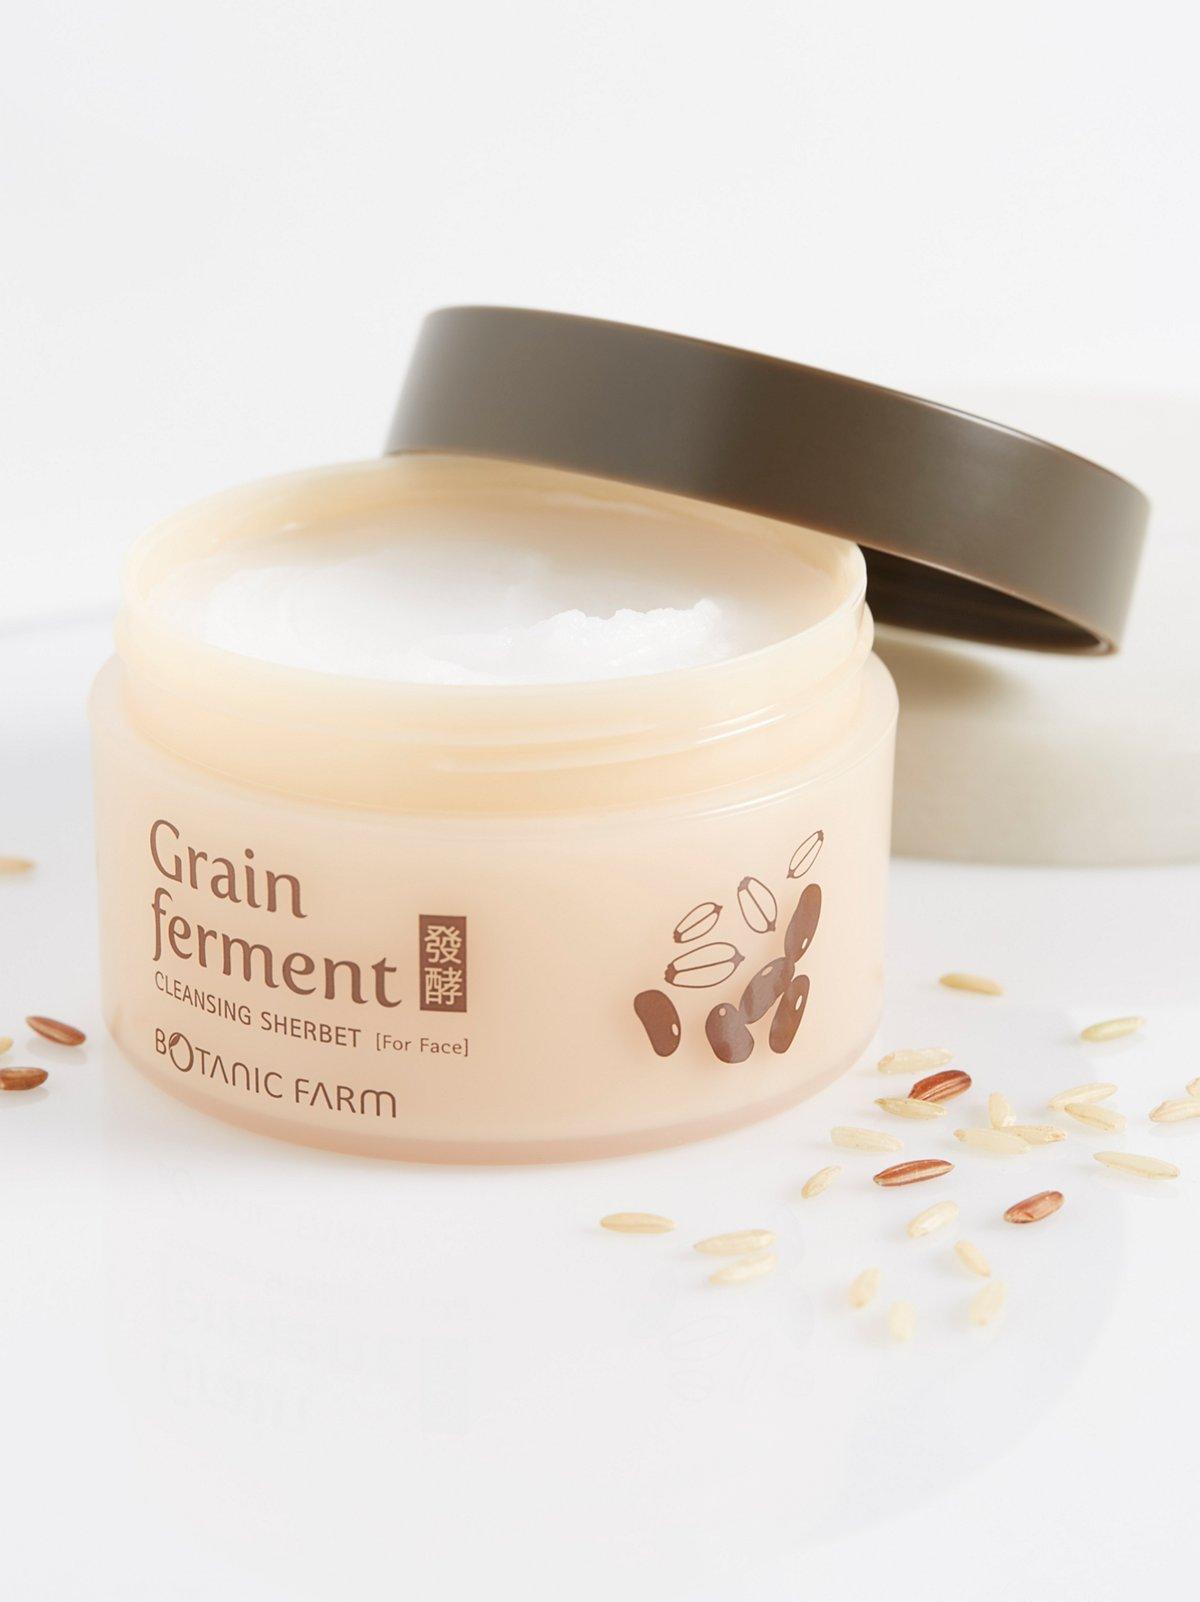 Grain Ferment卸妆乳